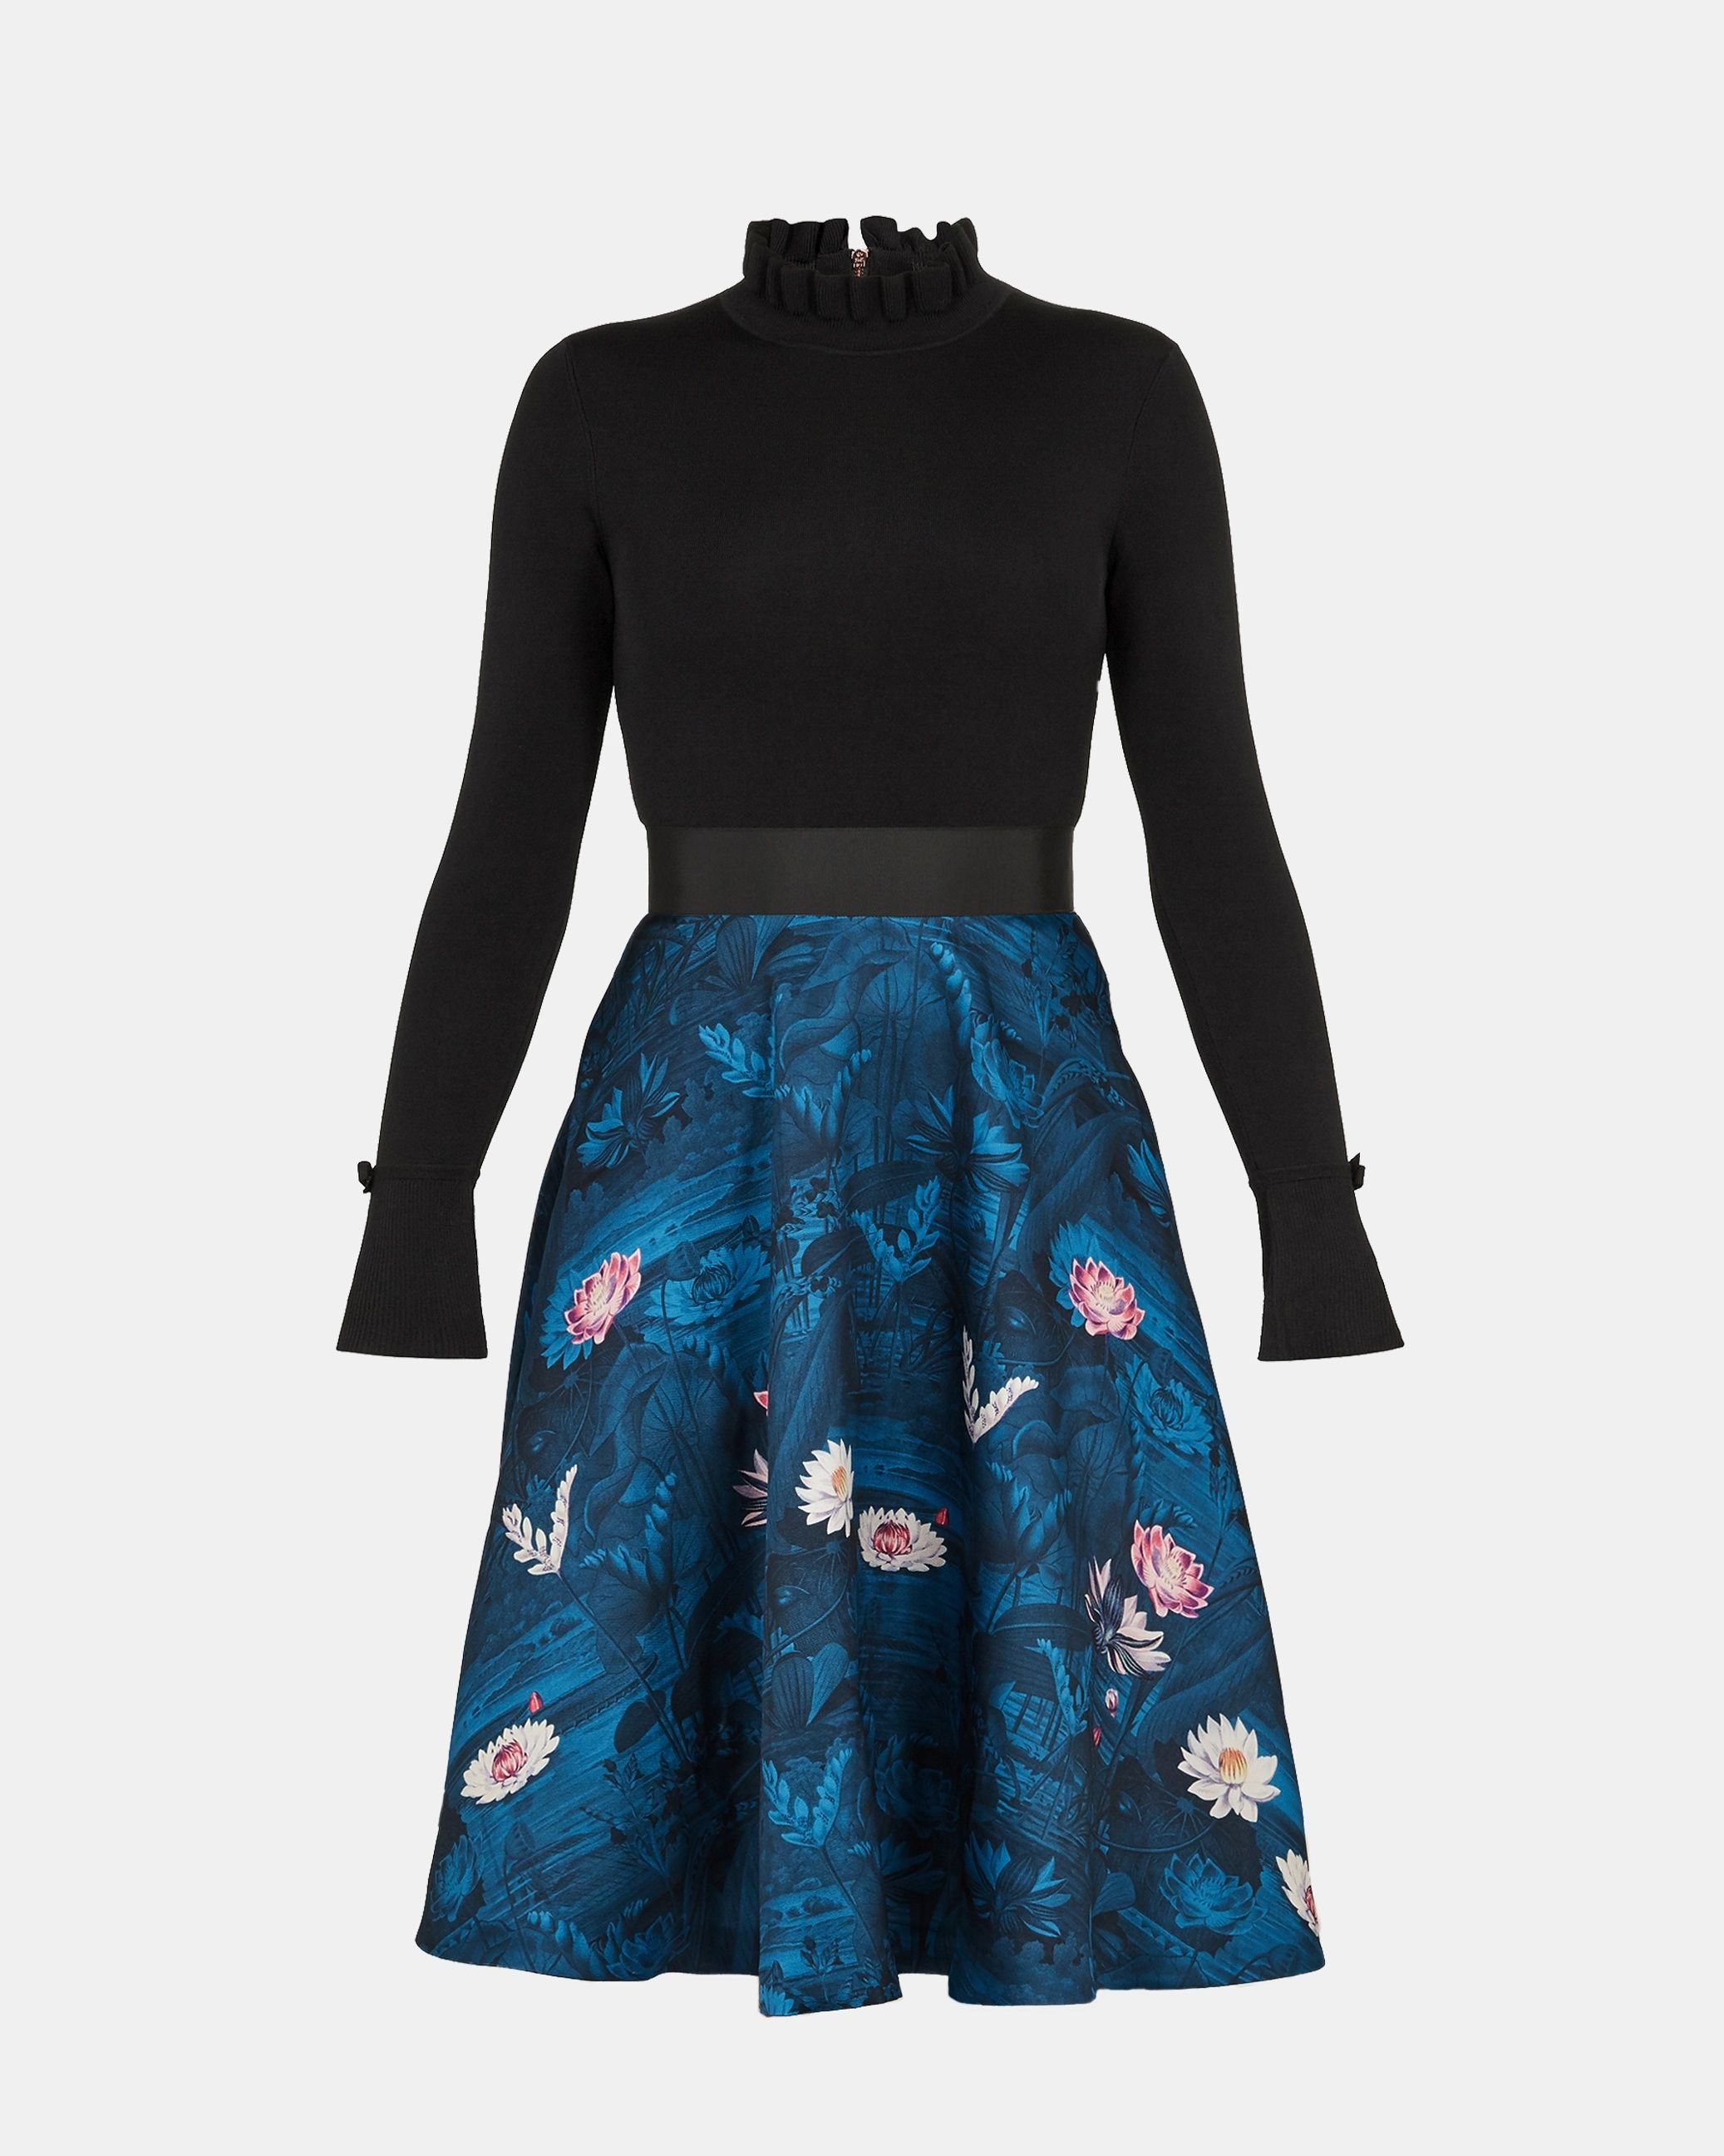 Ted Baker Kalinaa Wonderland Knit Bodice Dress in Black